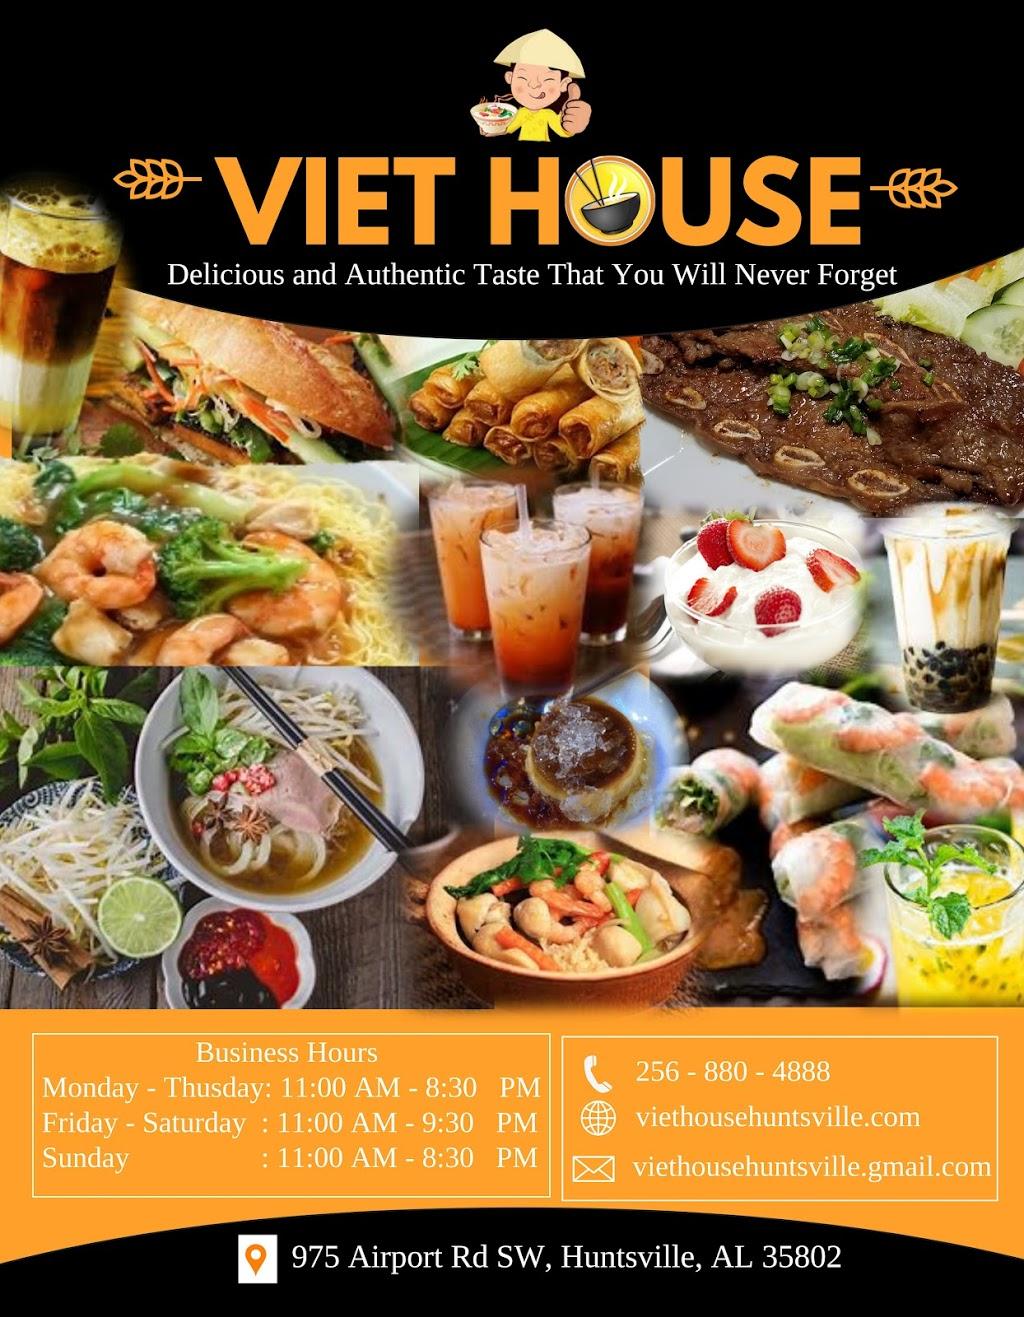 Viet House Restaurant   restaurant   975 Airport Rd SW Suite B2, Huntsville, AL 35802, USA   2568804888 OR +1 256-880-4888